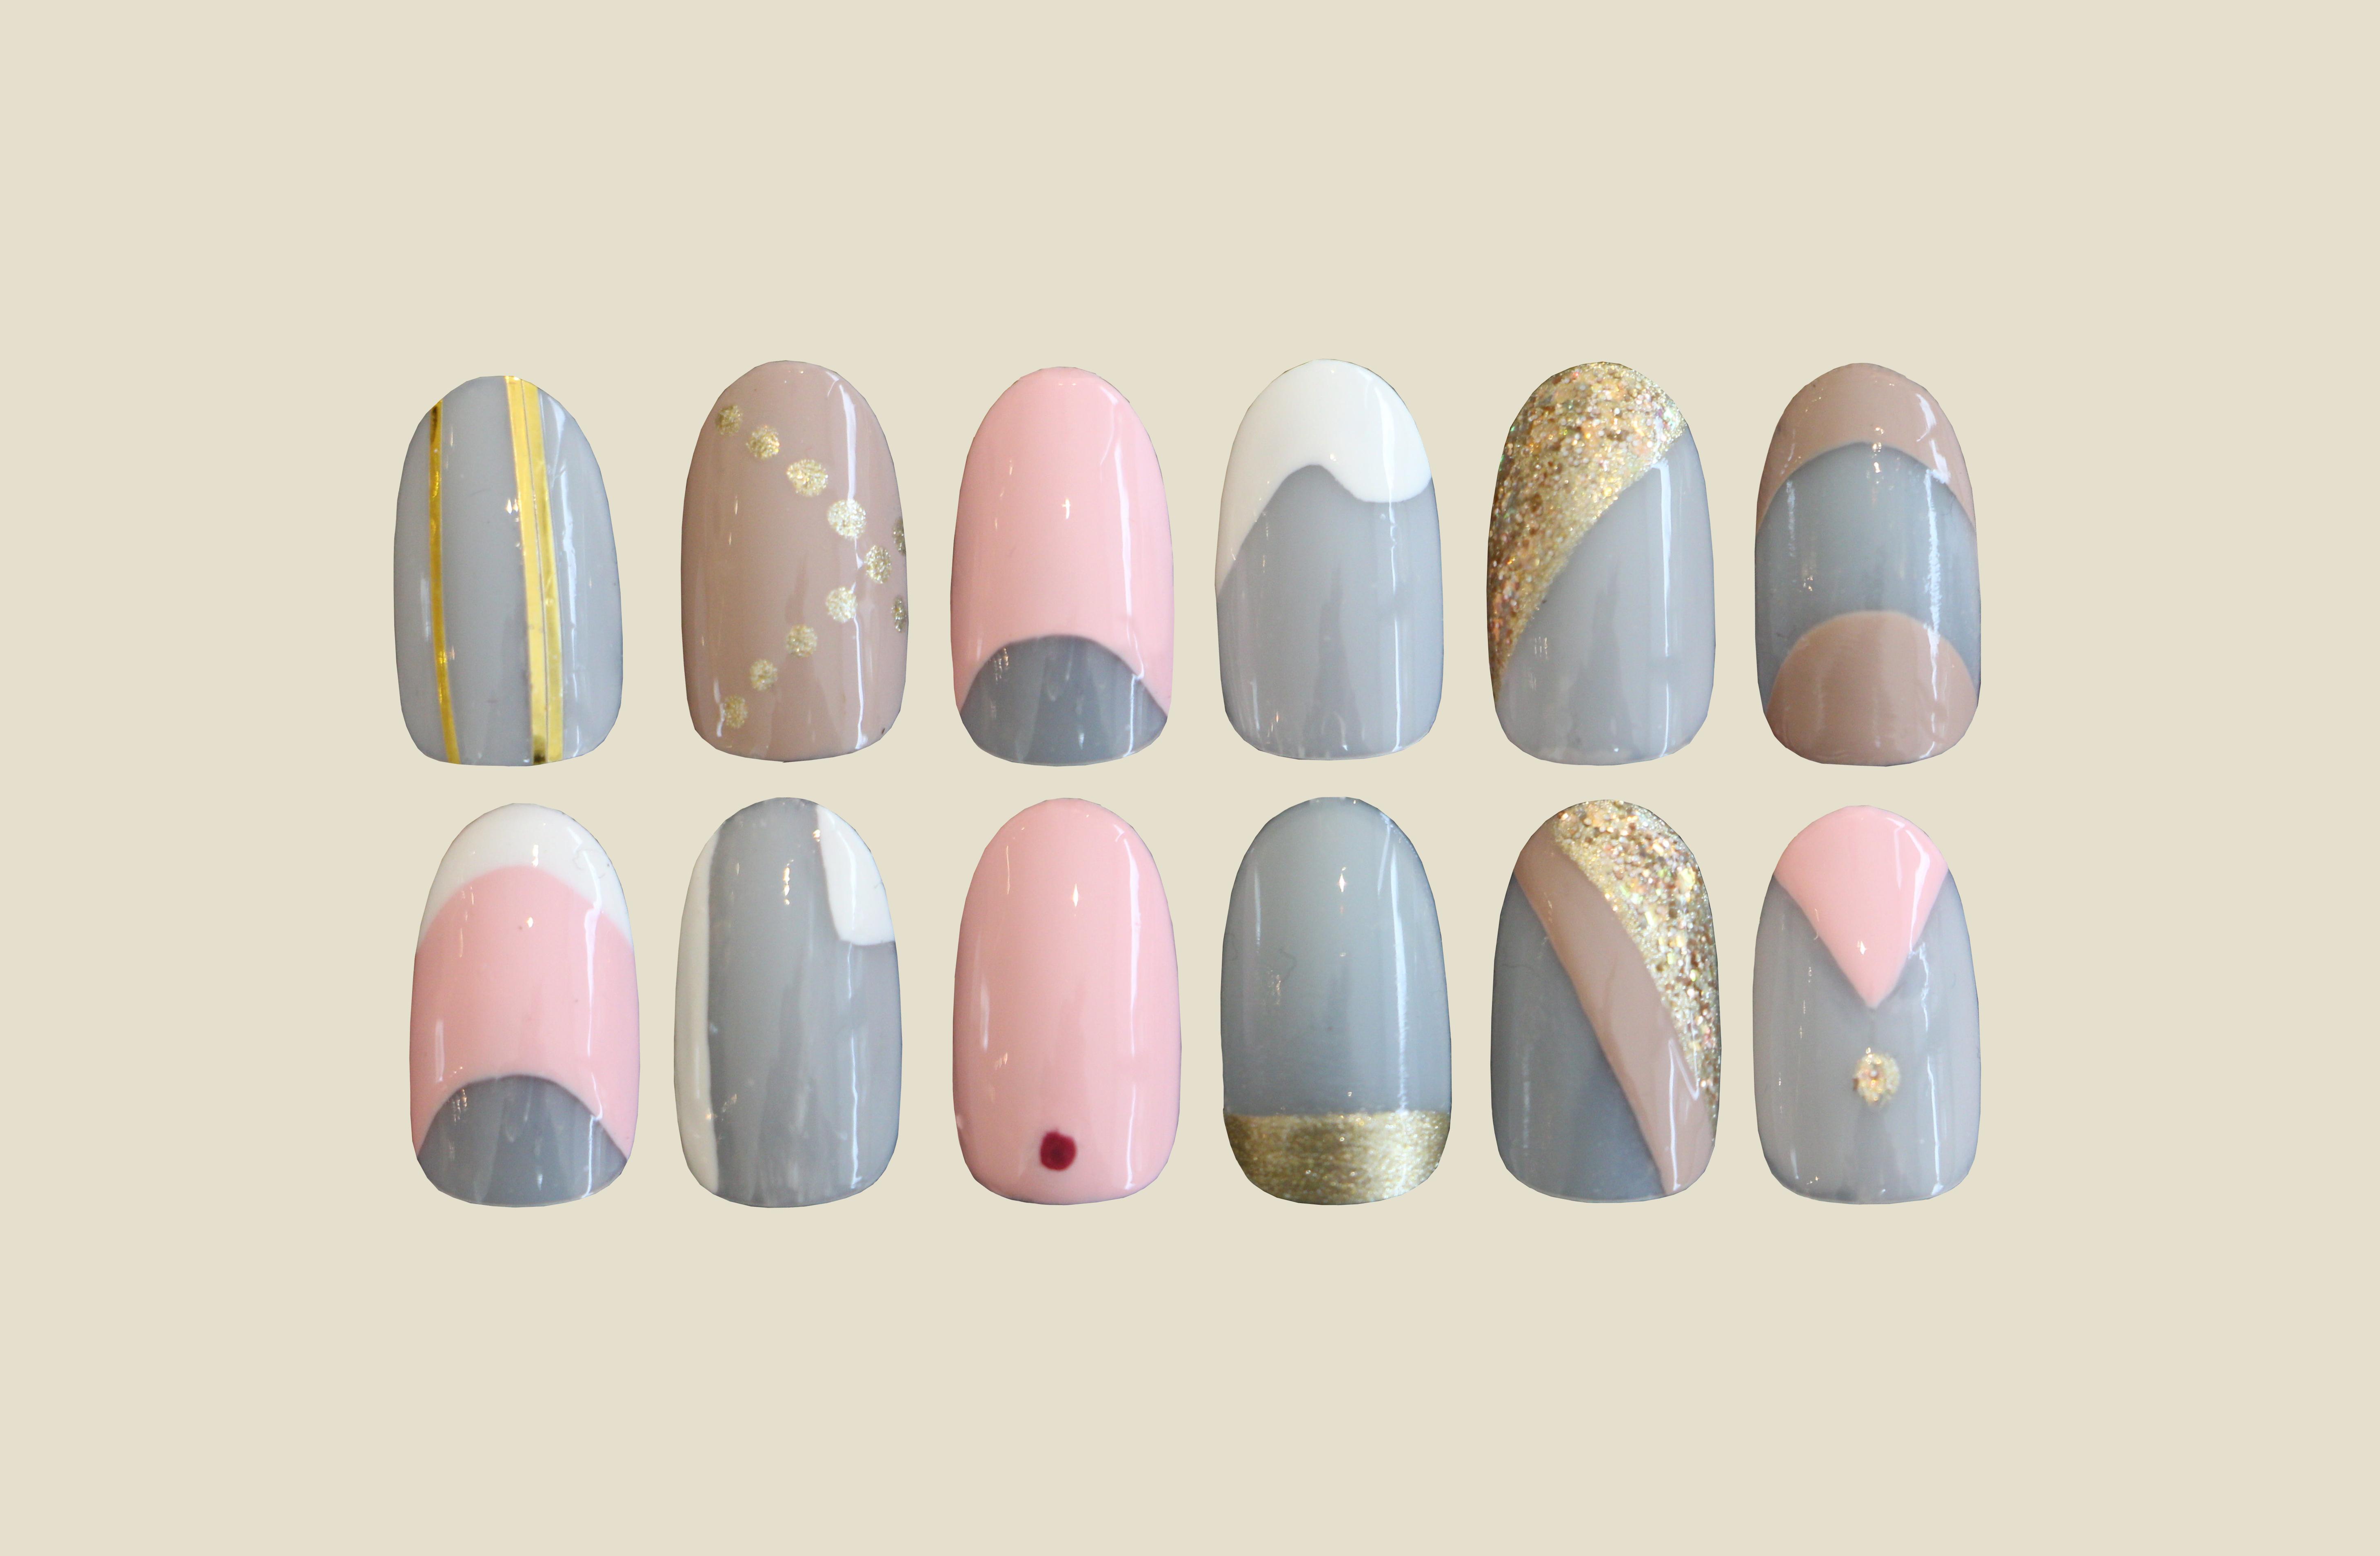 12 Nail Art Designs for Spring 2018 | LeSalon